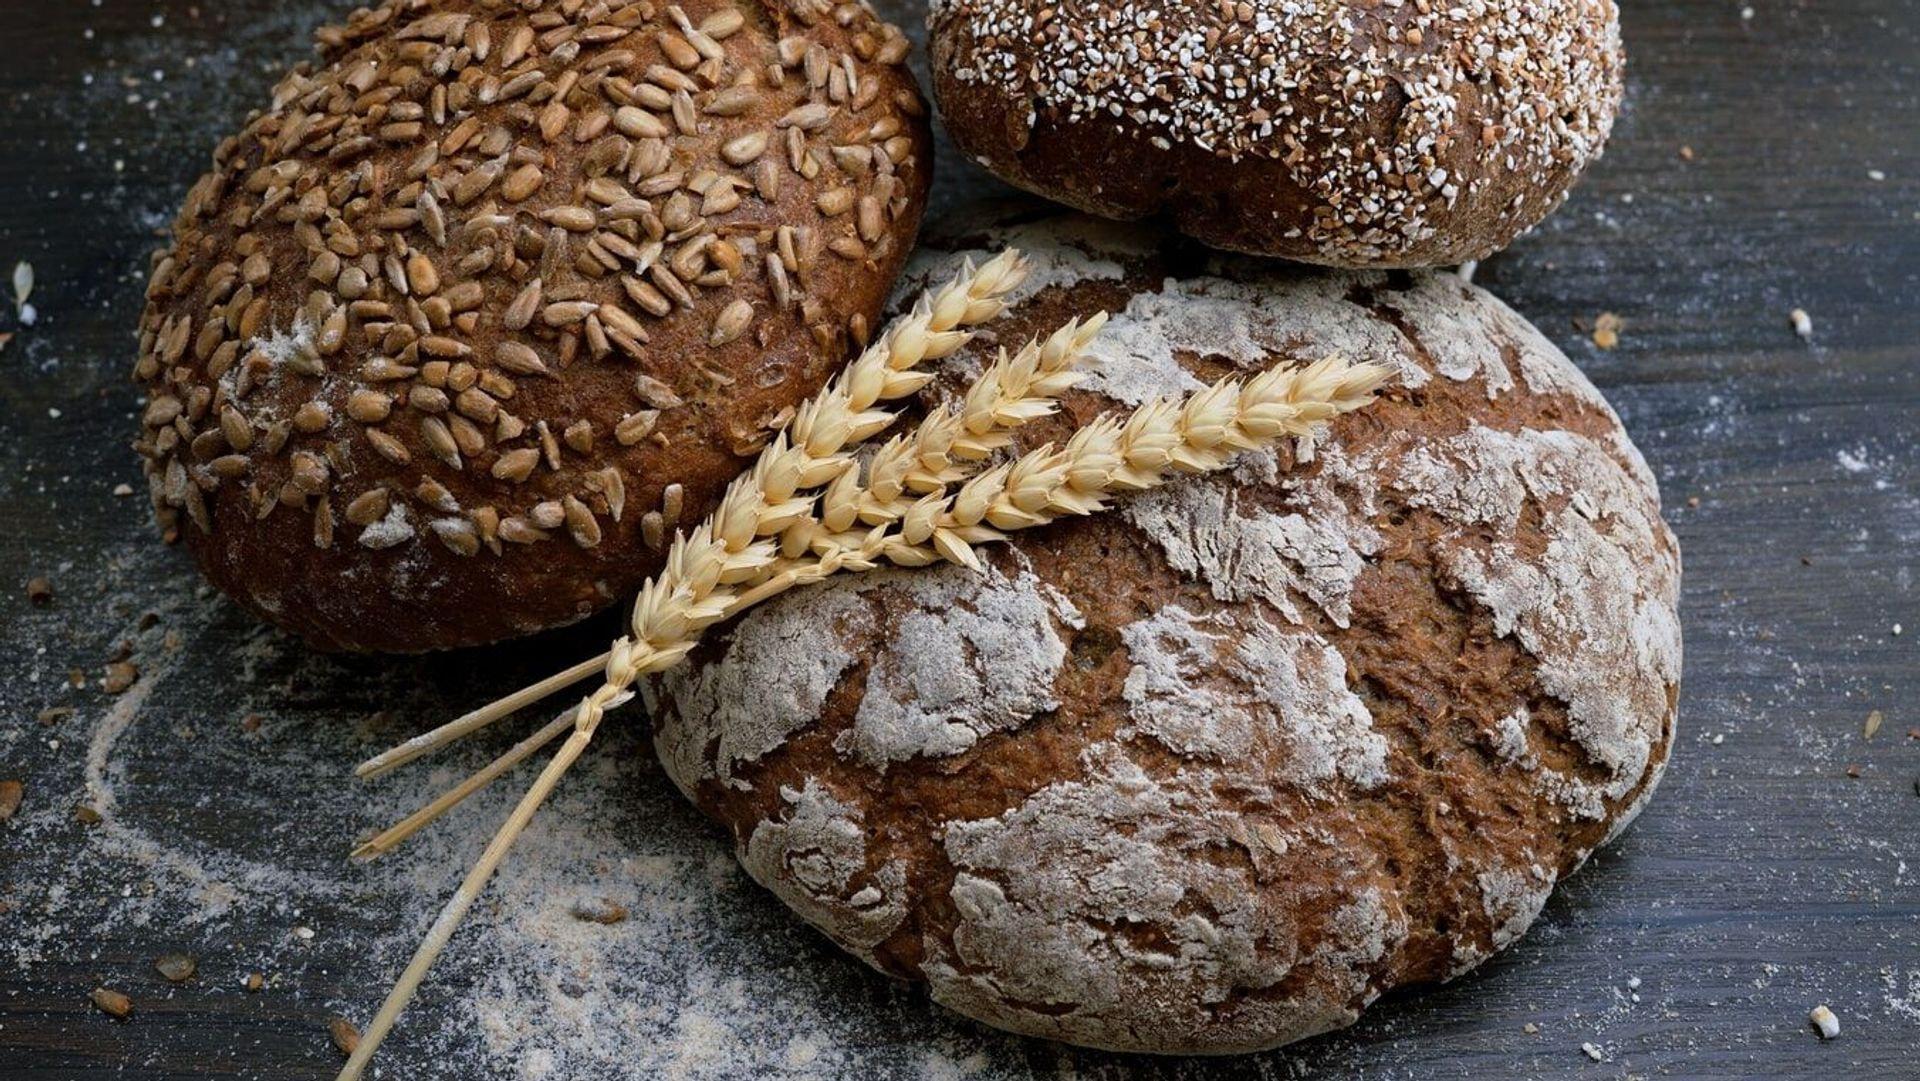 Pane fresco tutte le mattine a la favorita